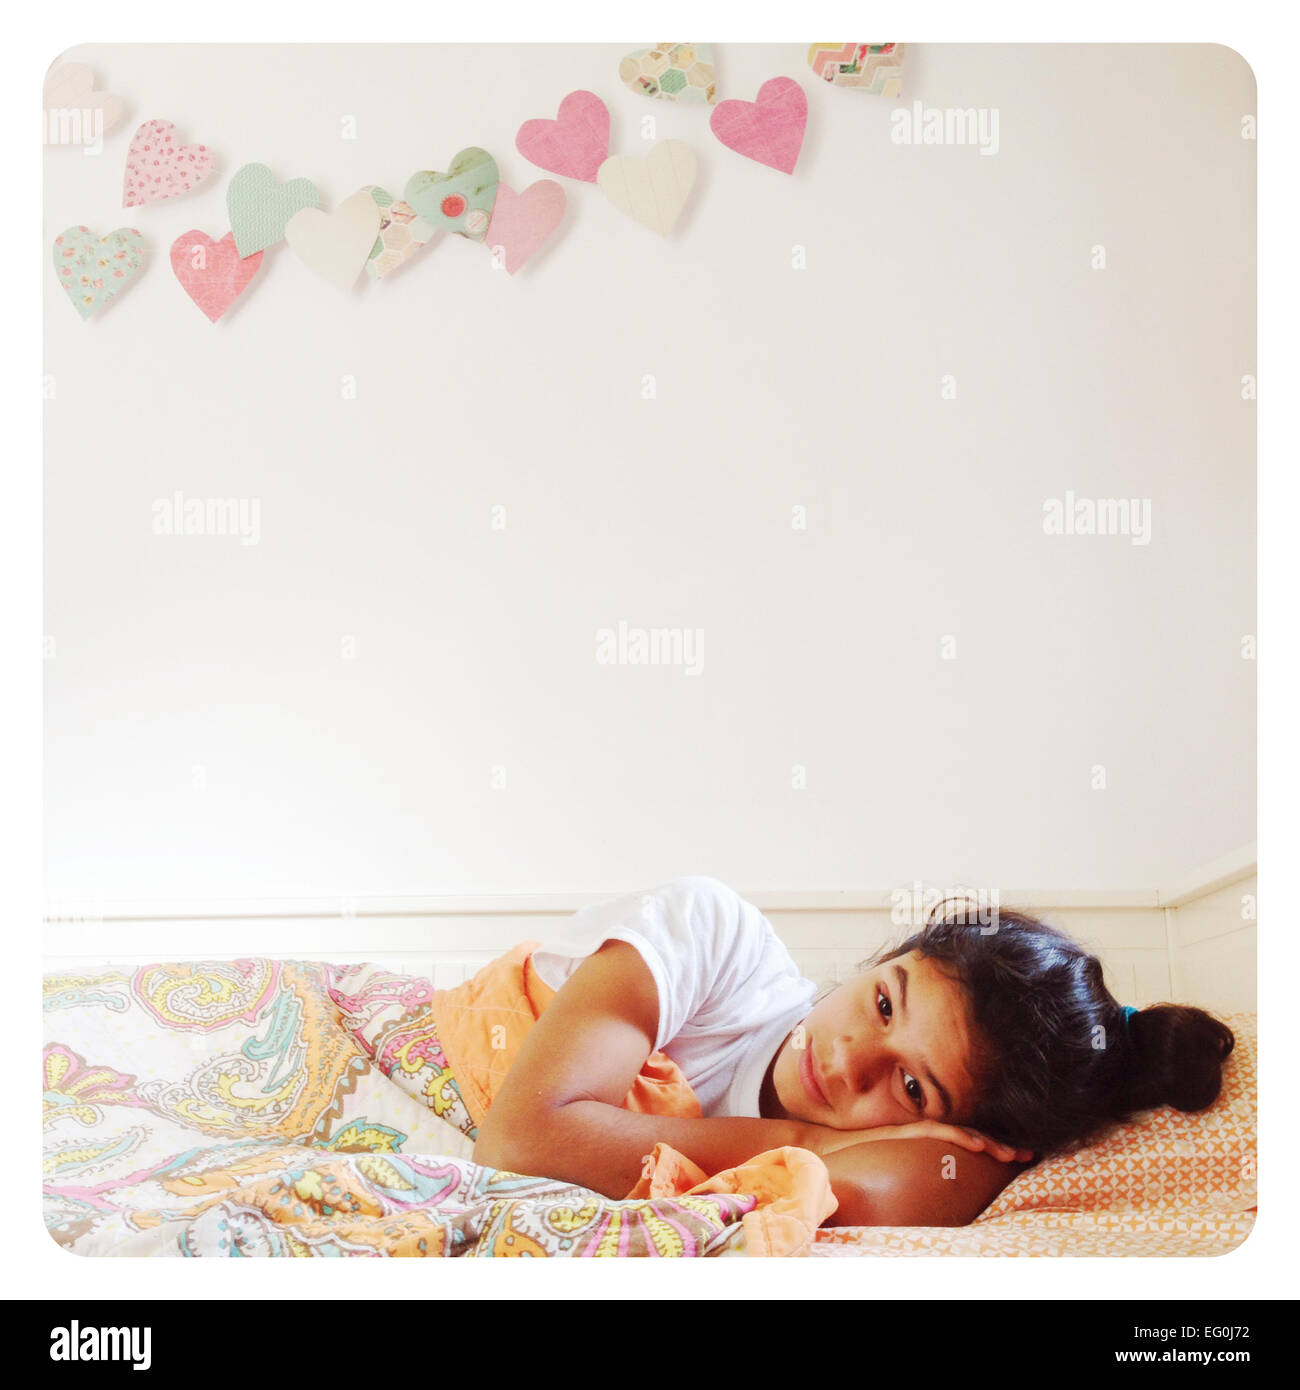 Girl Lying in Bed Photo Stock